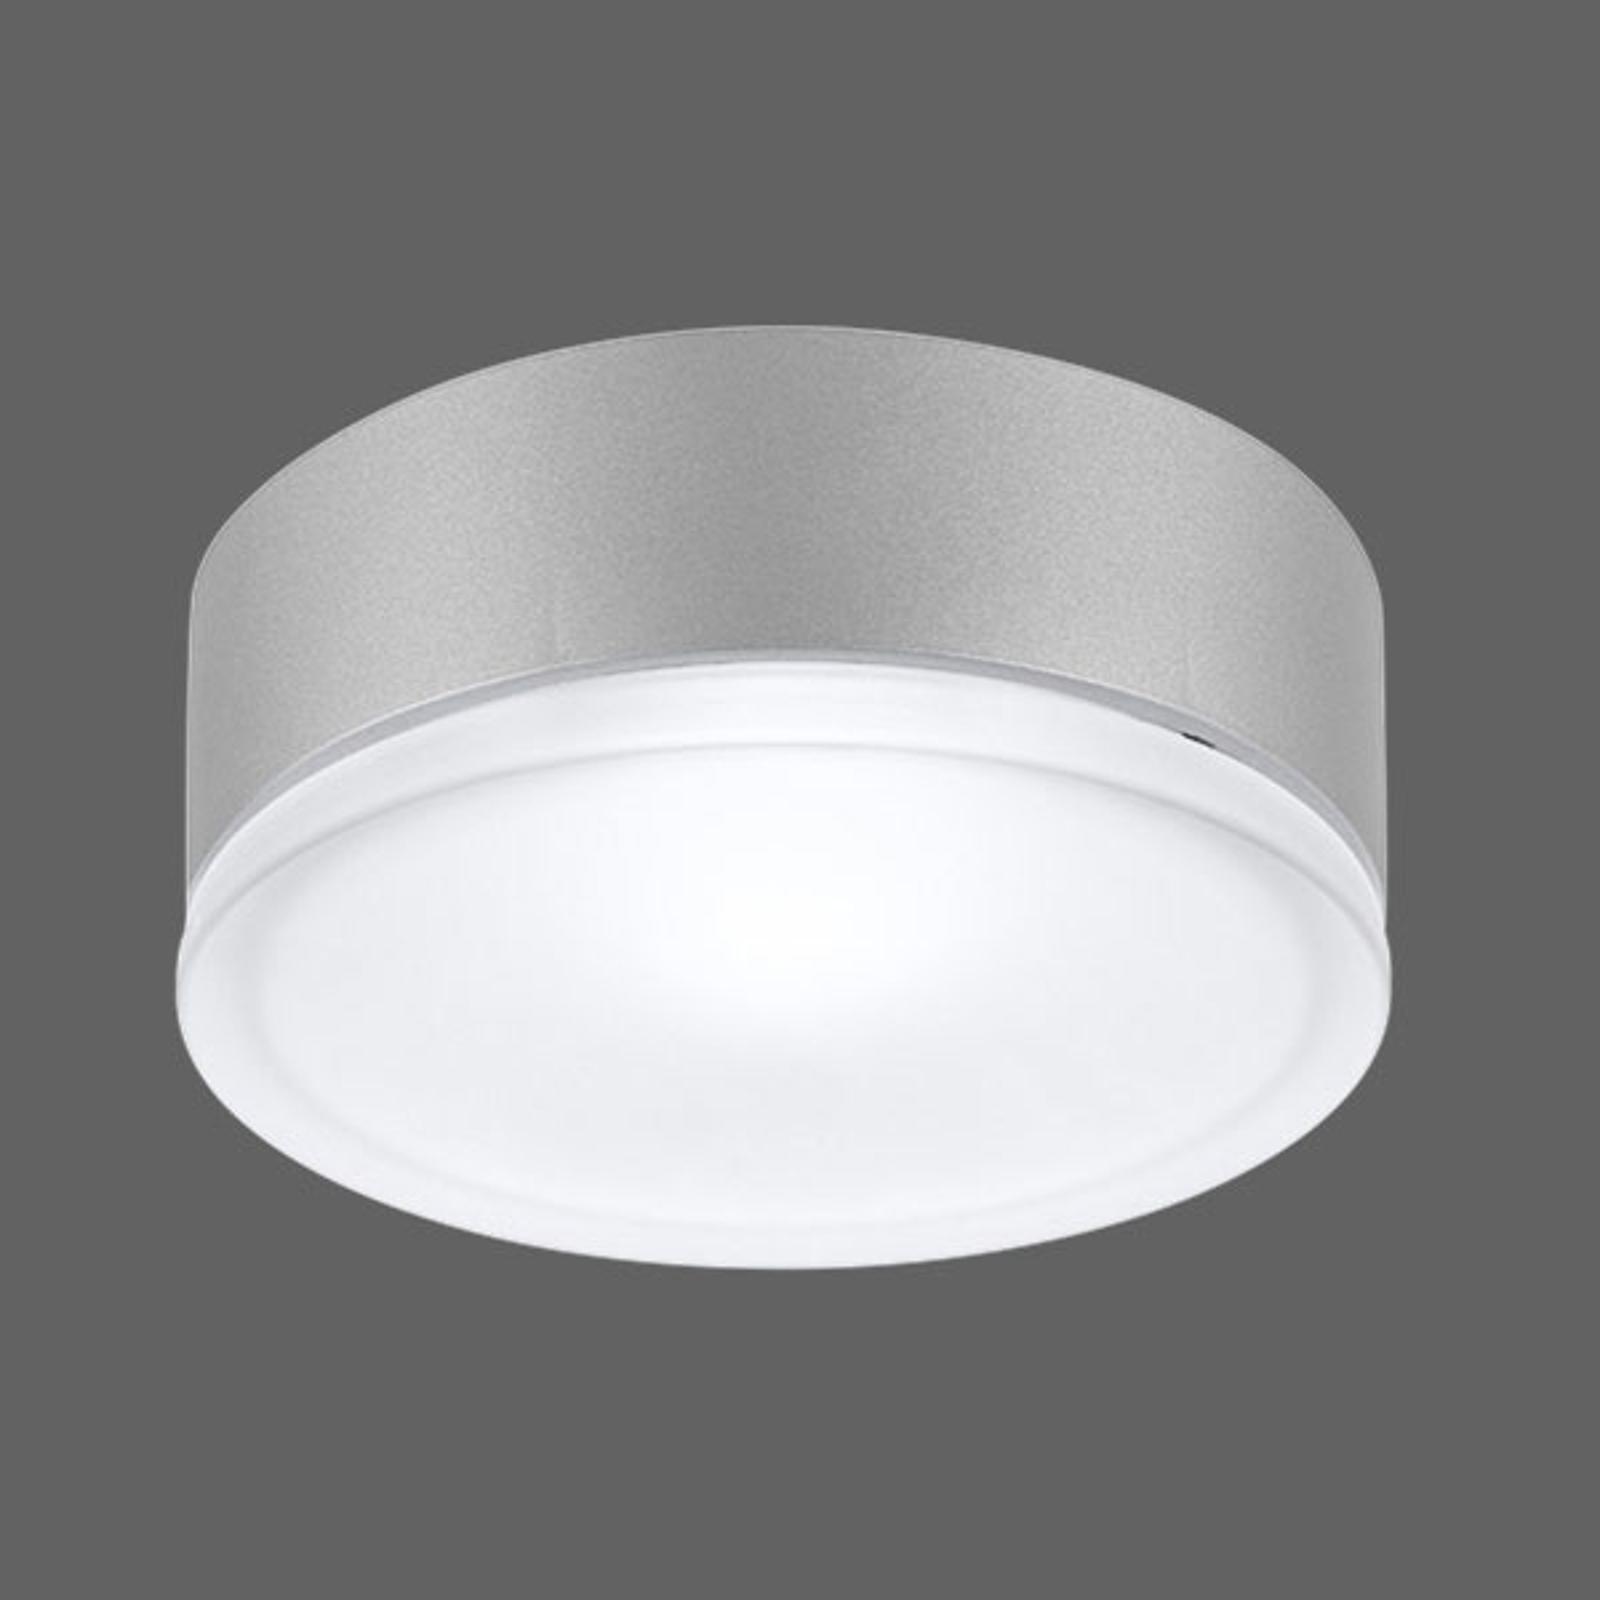 Drop 28 LED Außenwandleuchte in Grau 3.000K